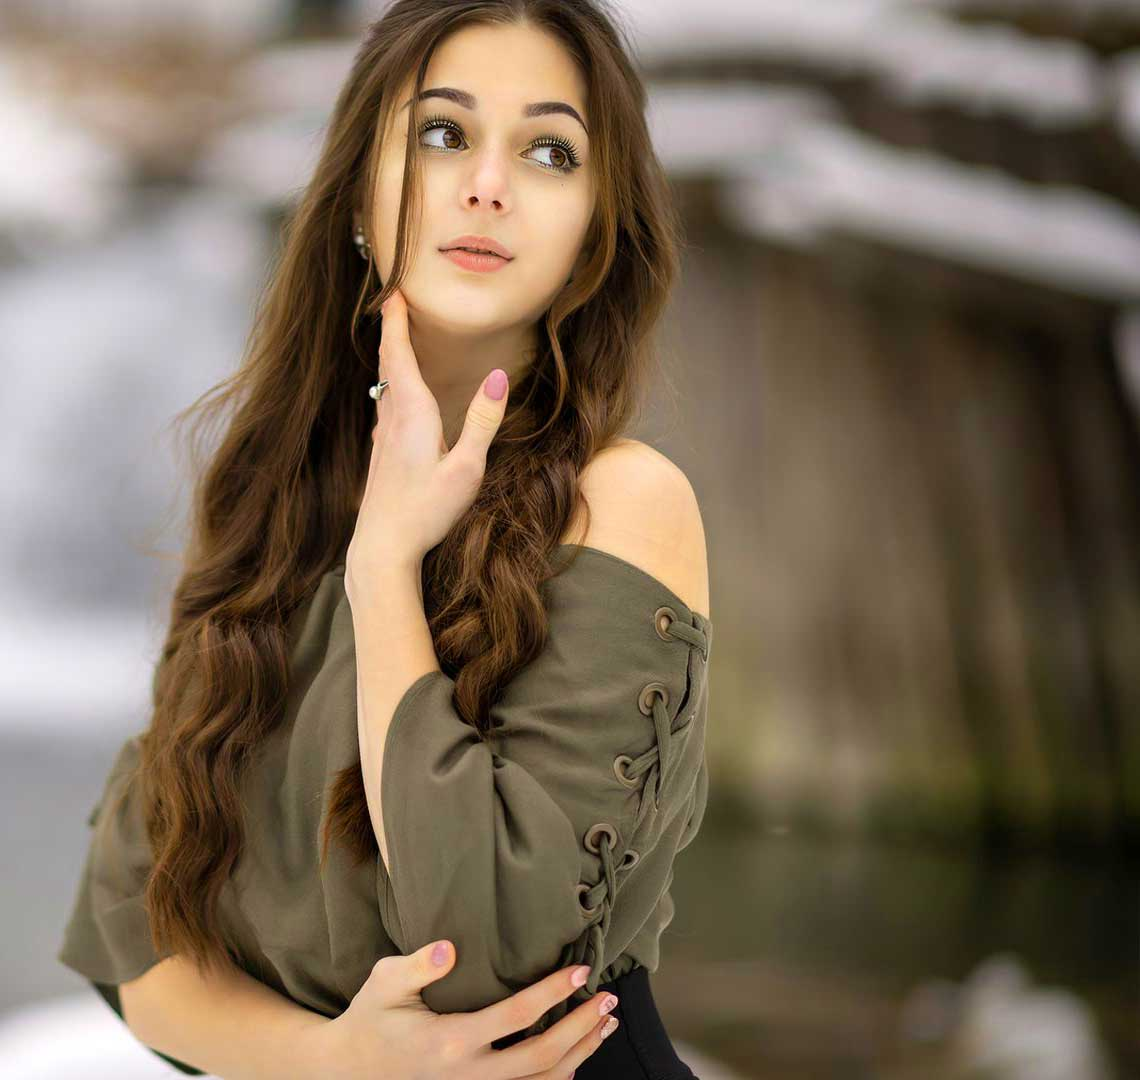 indian beautiful girl images Wallpaper Download